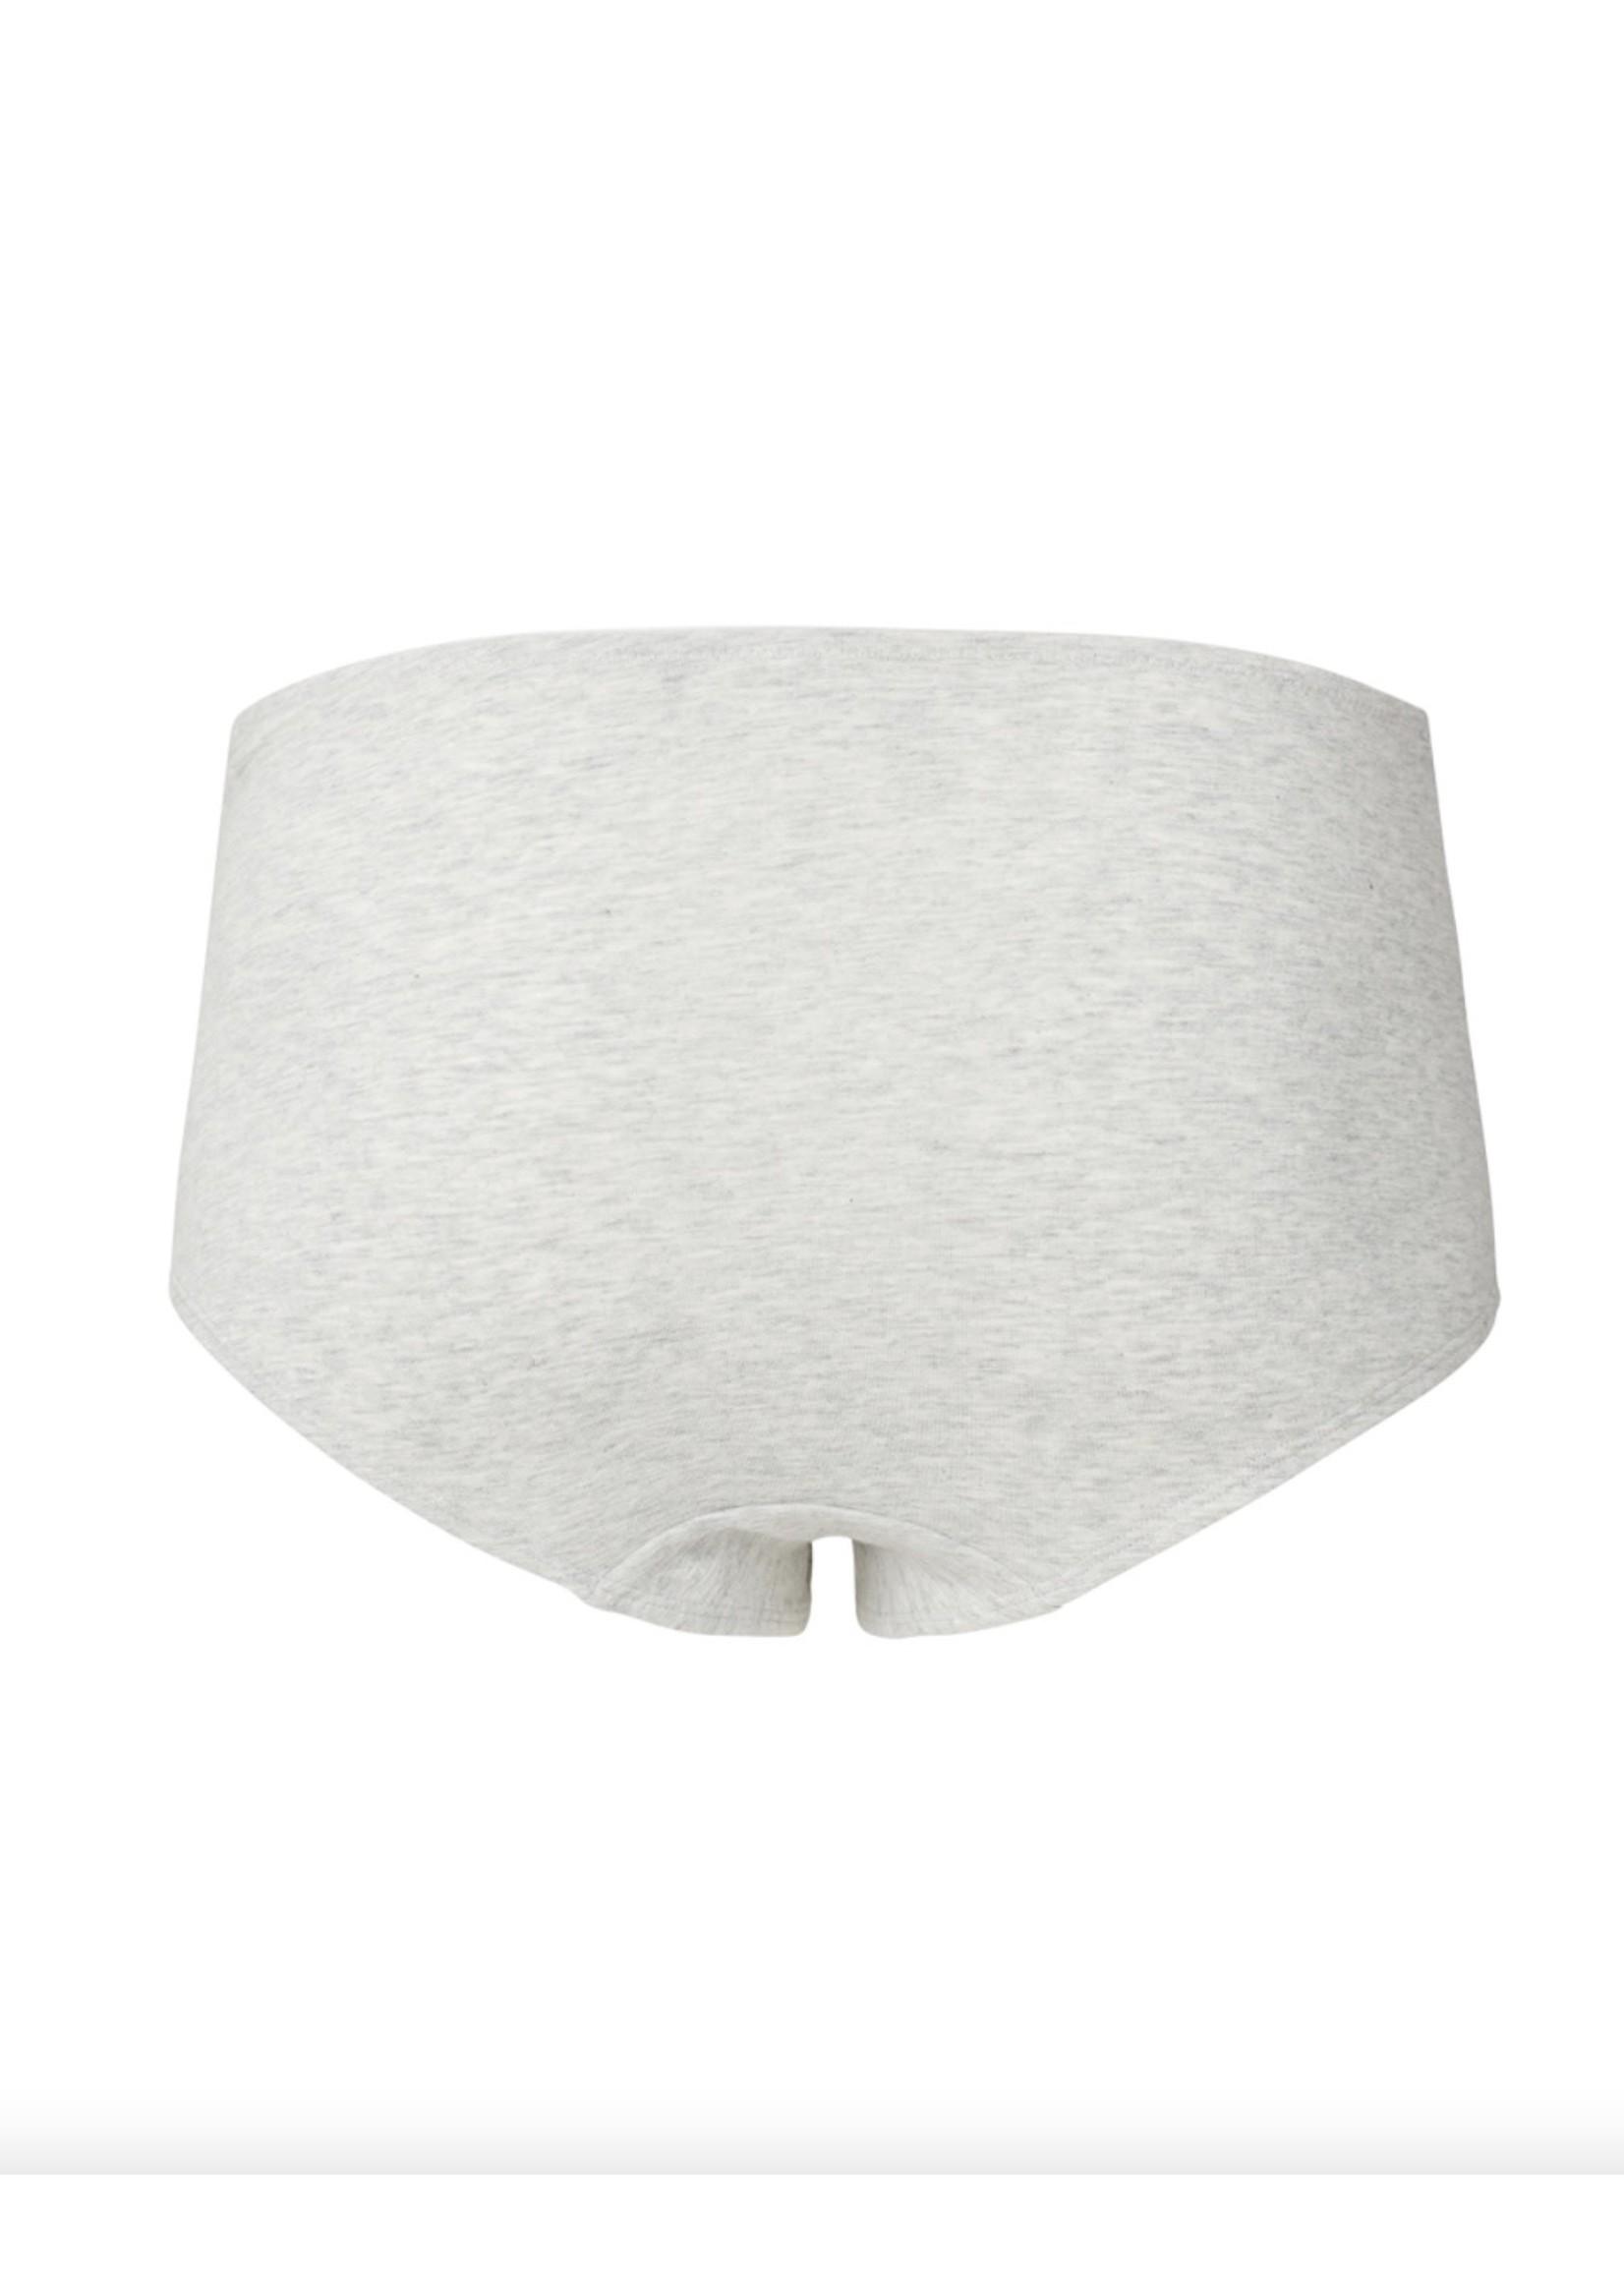 Noppies Maternity Noppies Maternity, Melange Cotton Short Style Maternity Underwear